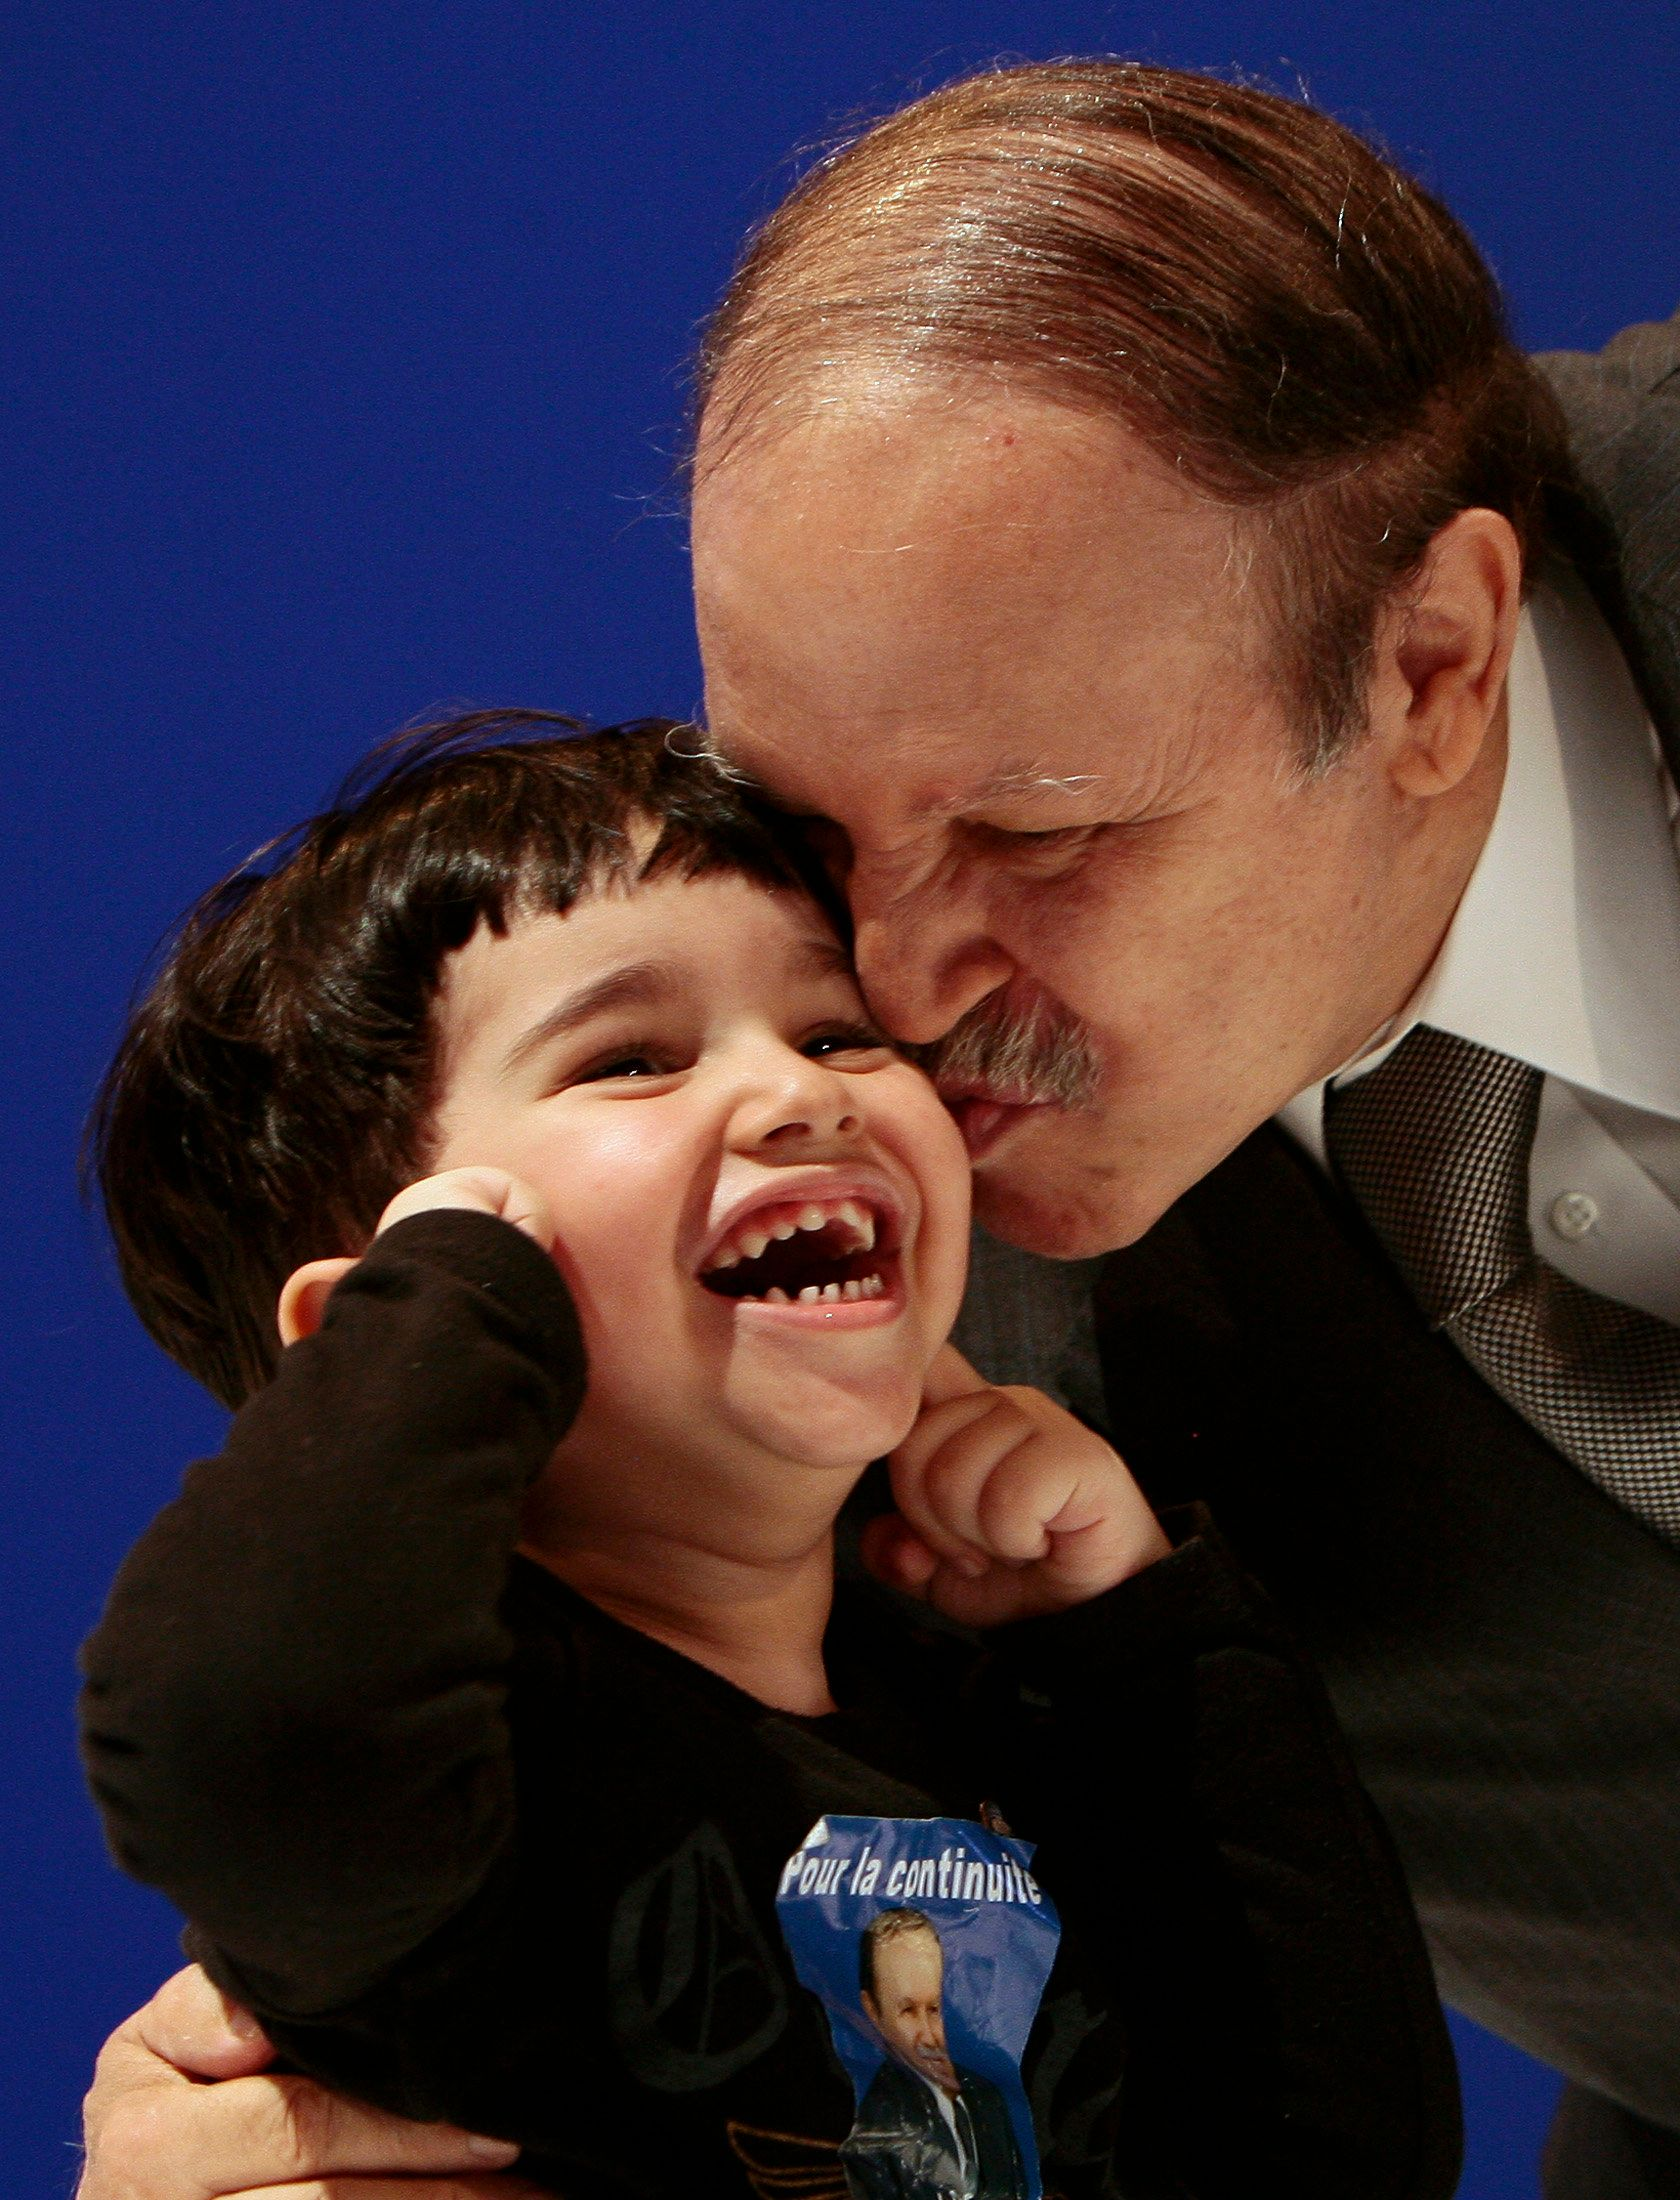 Madjer - Bouteflika: cet irrépressible désir de nous